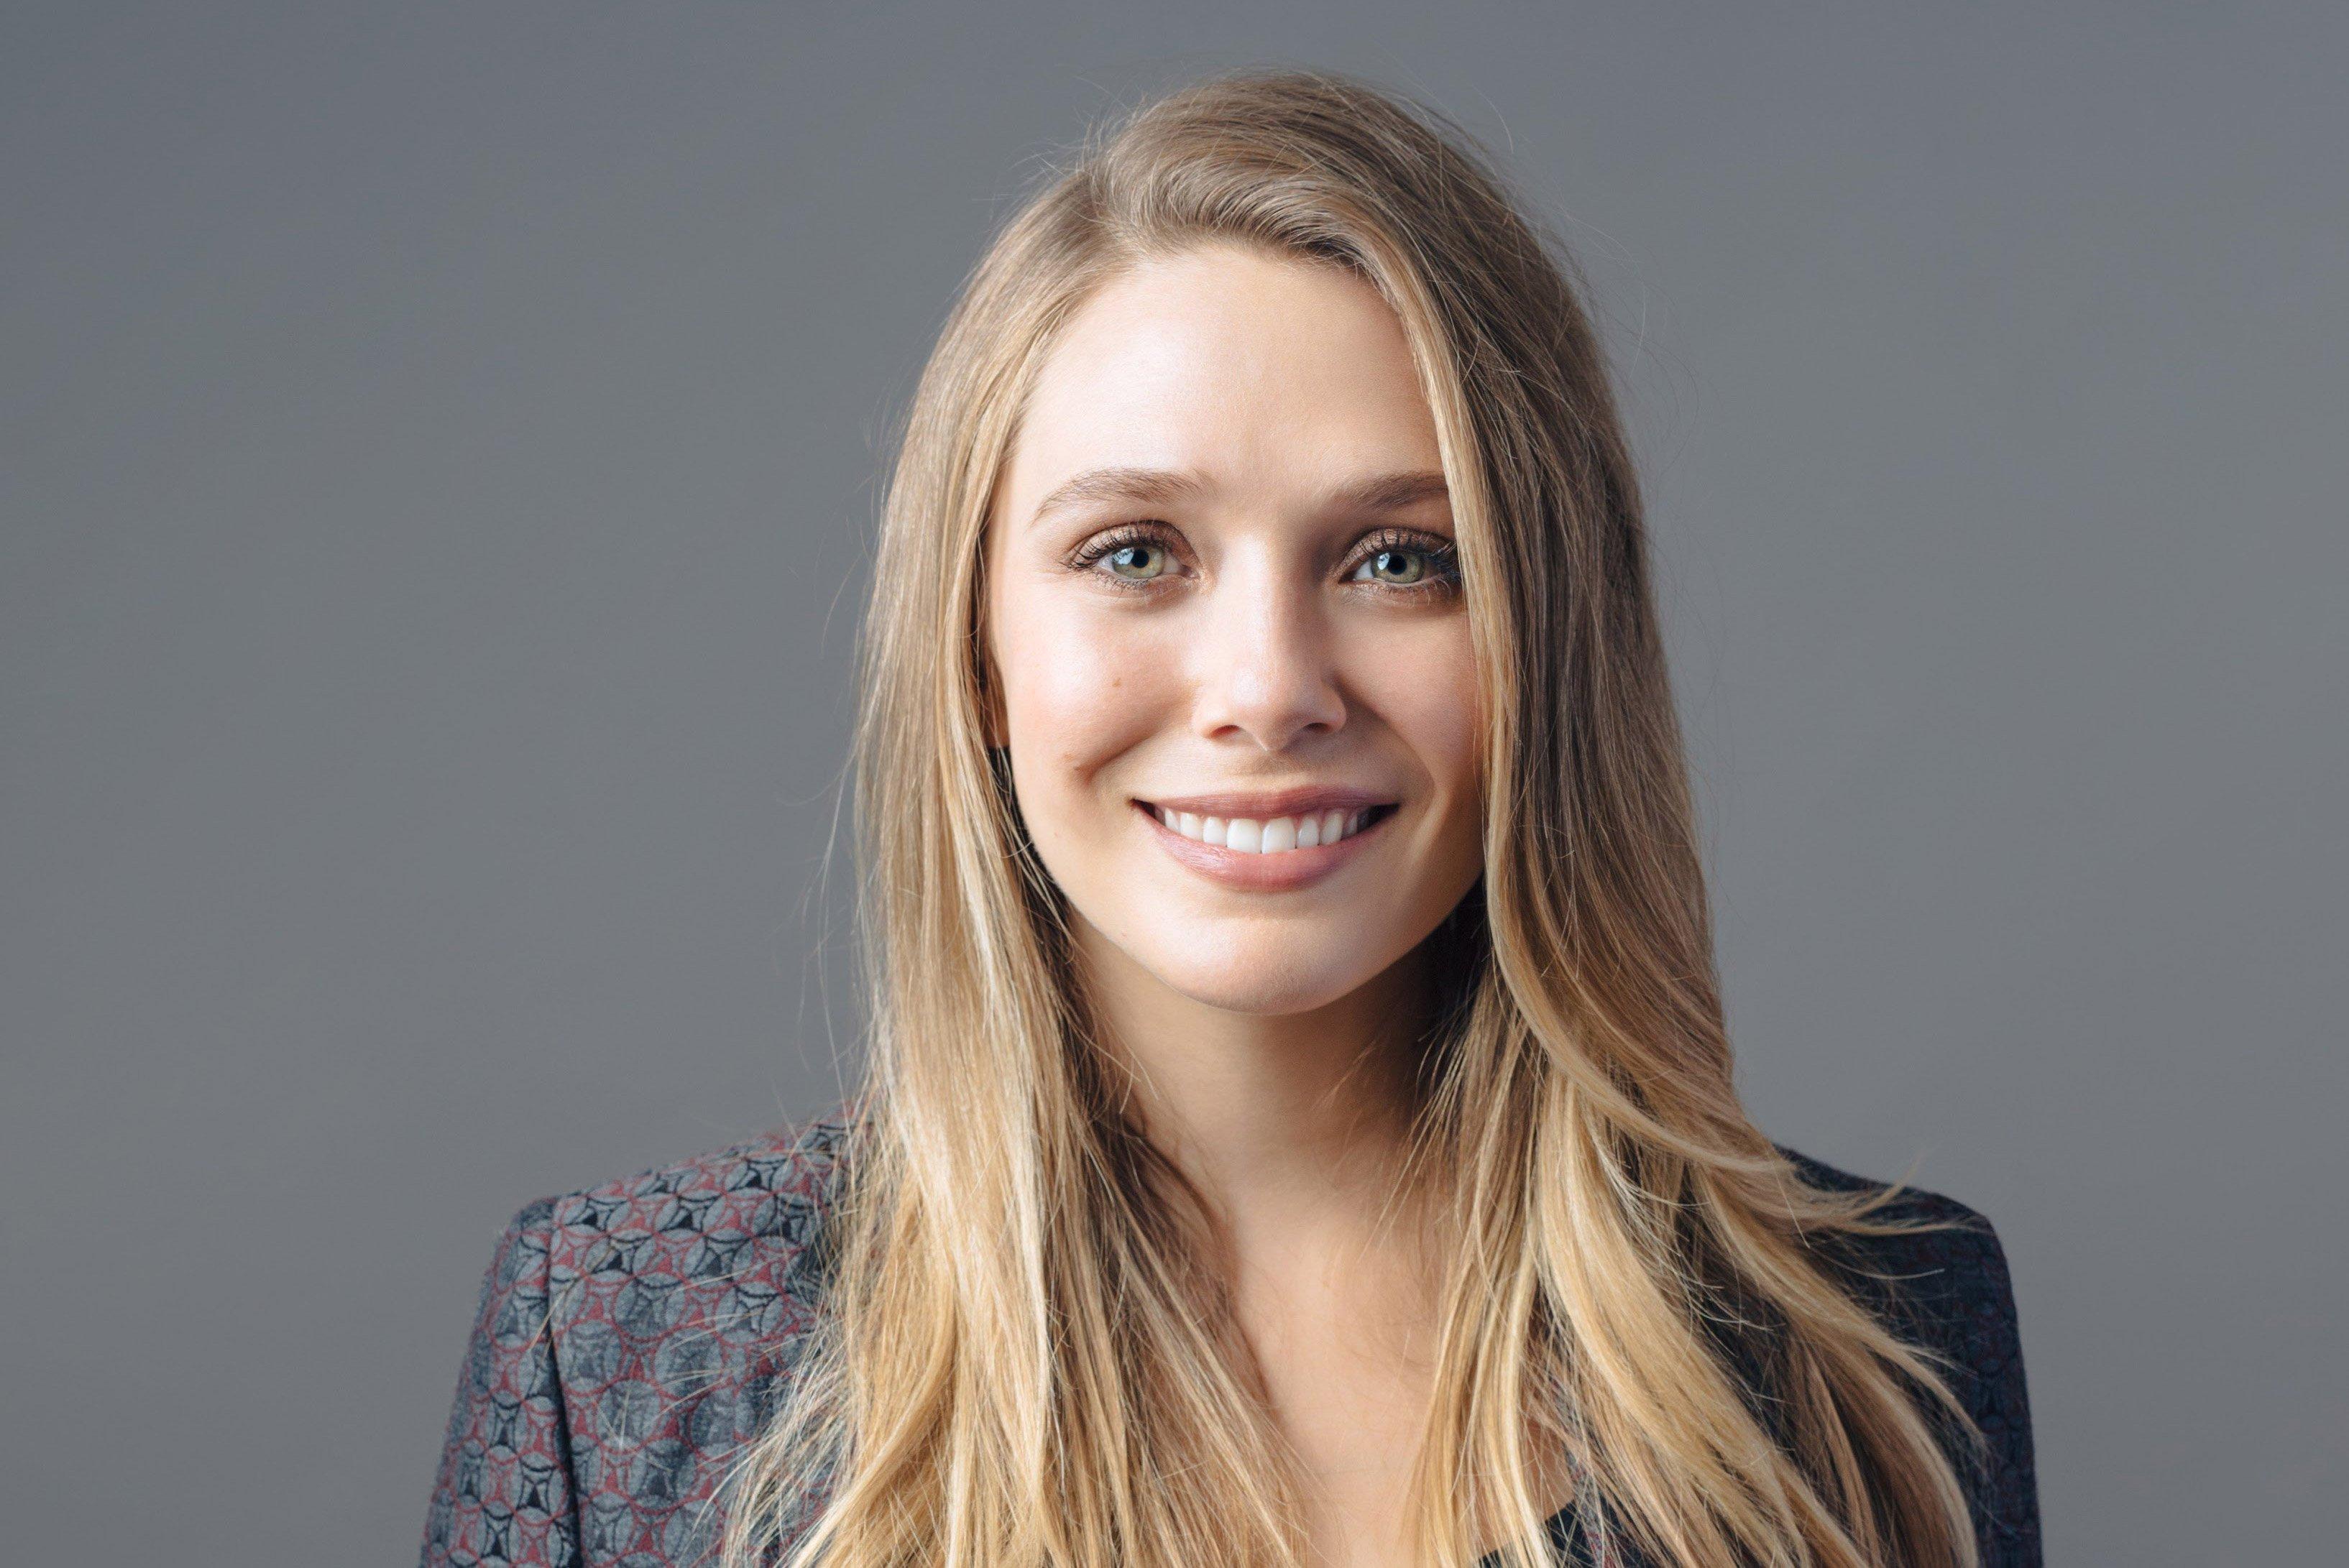 Wallpaper Elizabeth Olsen